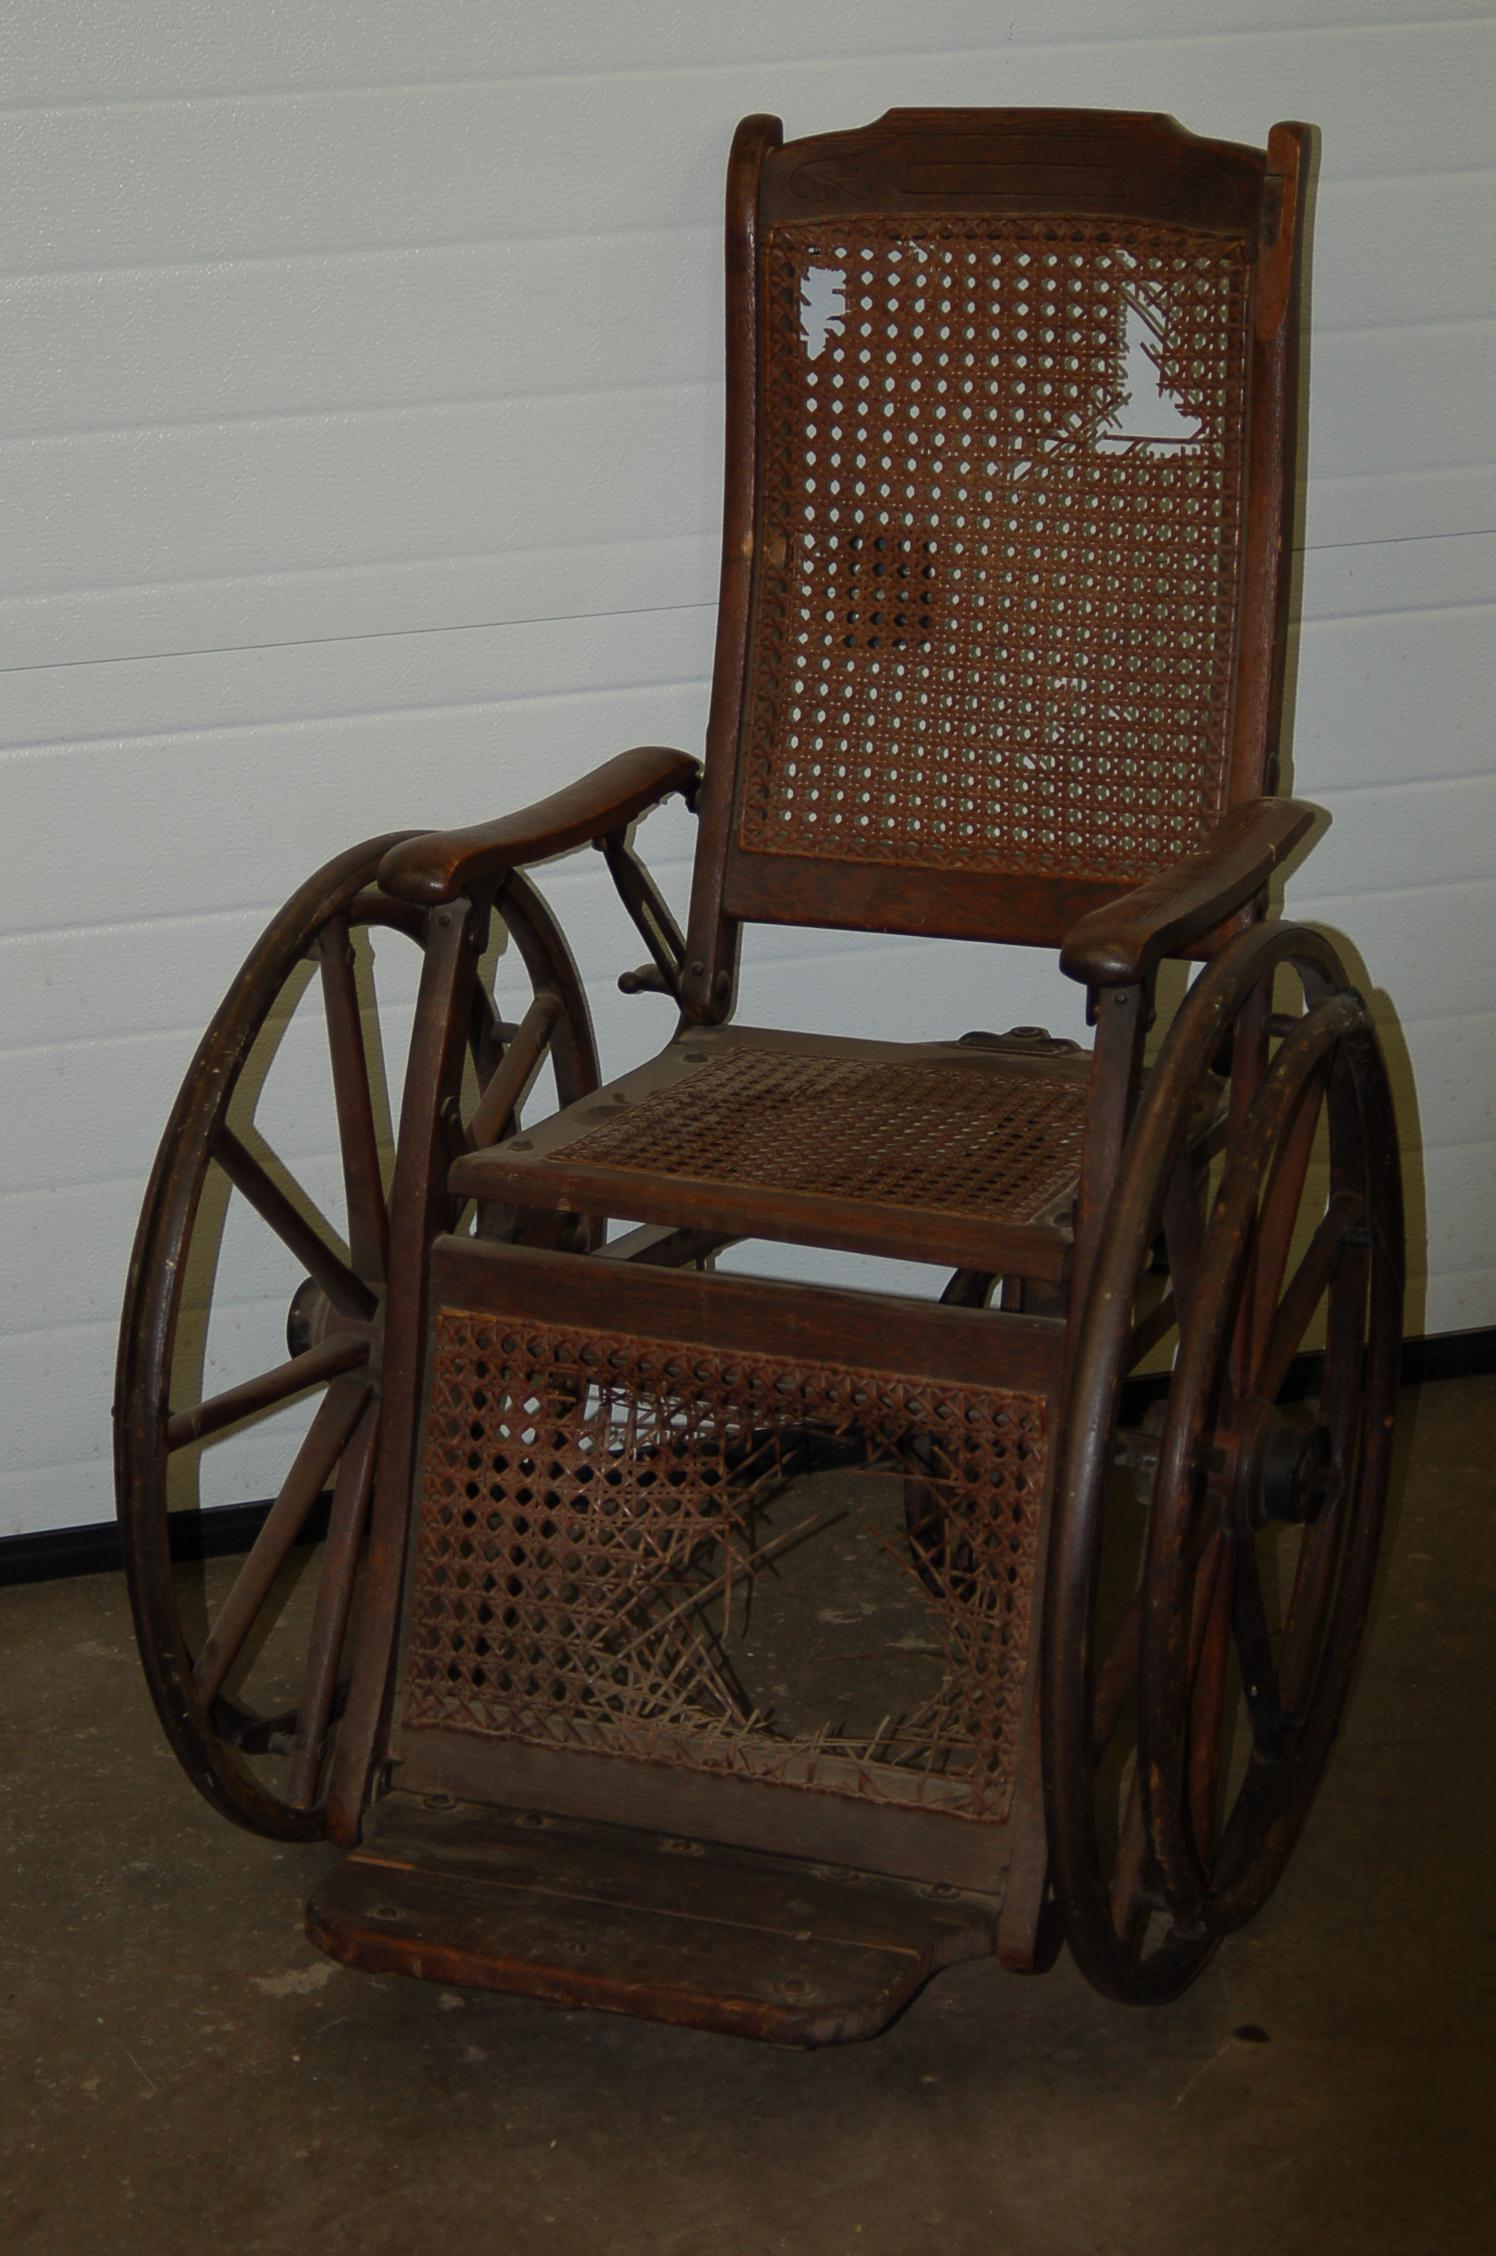 Antique Wheelchair - Before - Wheelchair - Before